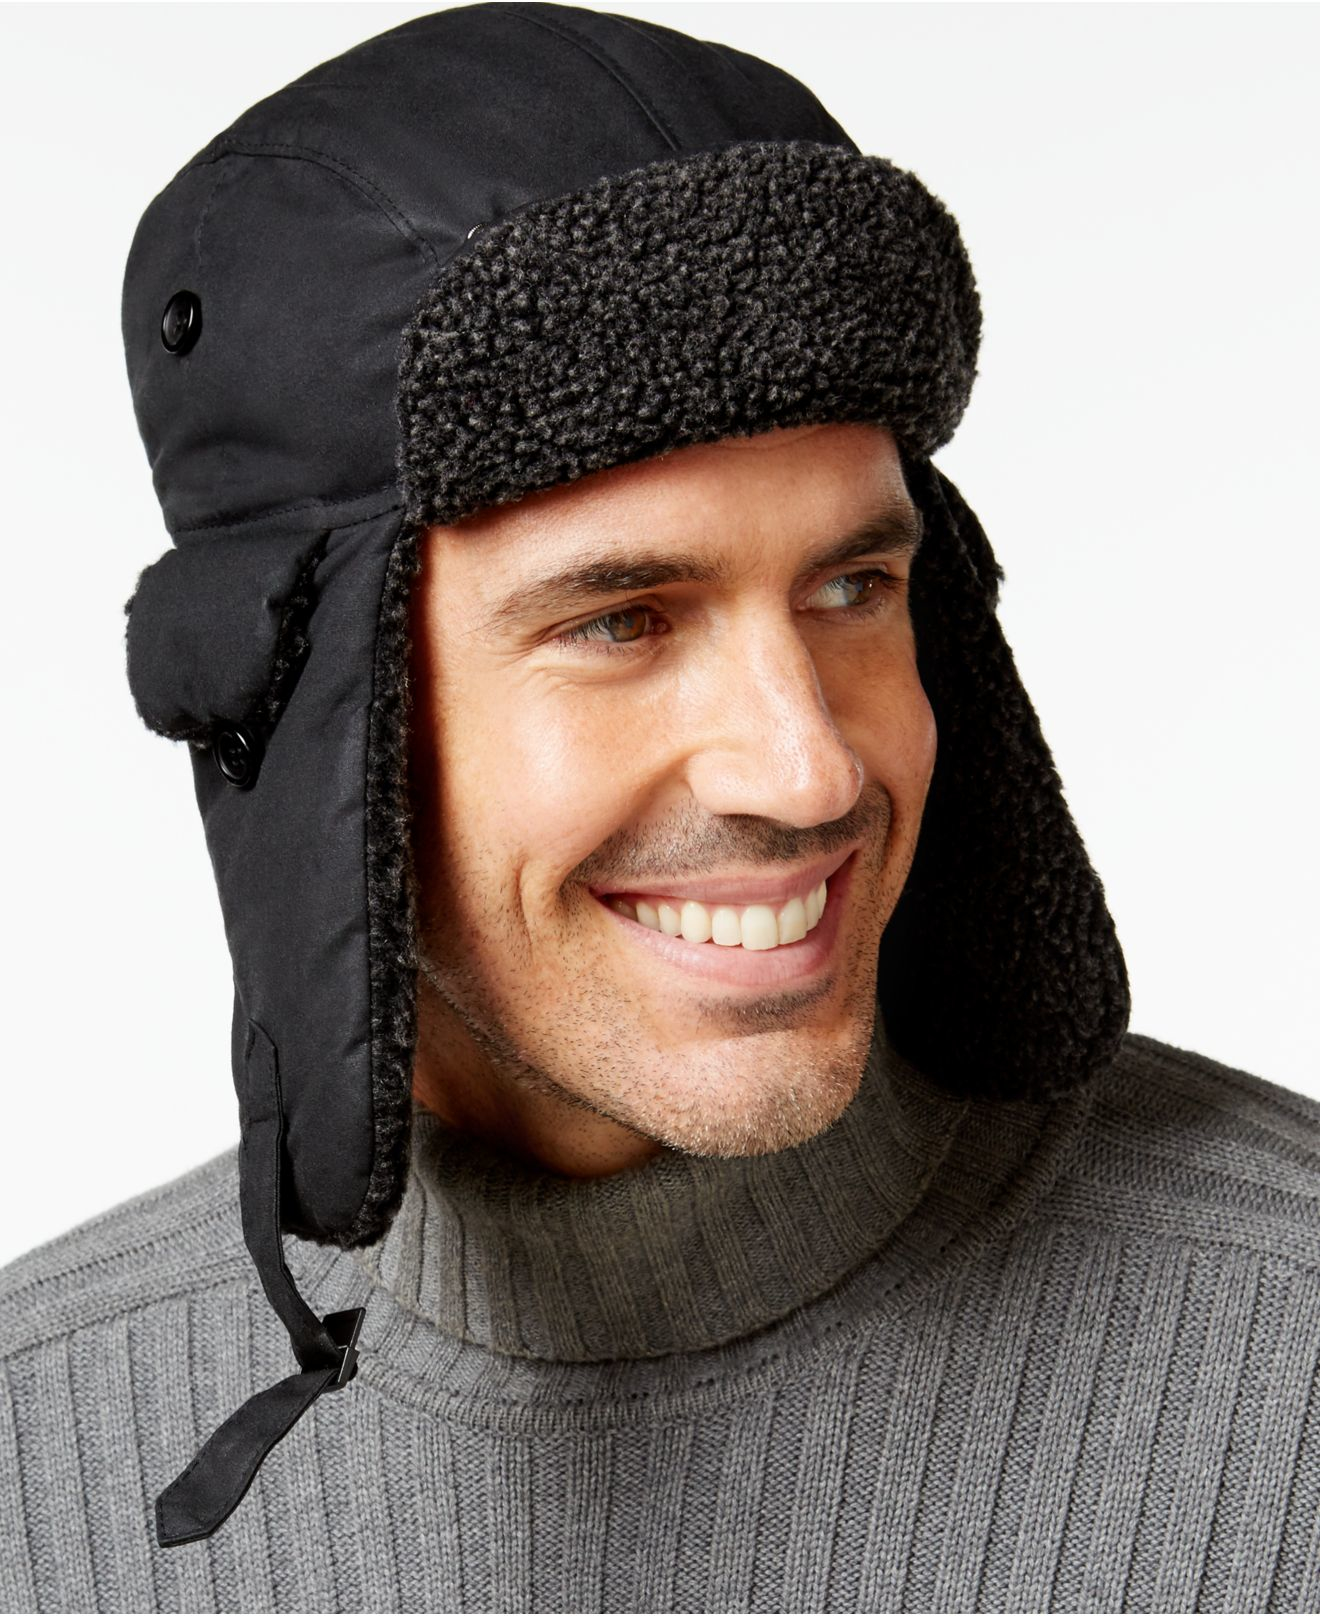 fd3c14d01340 Barbour Fleece-lined Trapper Hat in Black for Men - Lyst